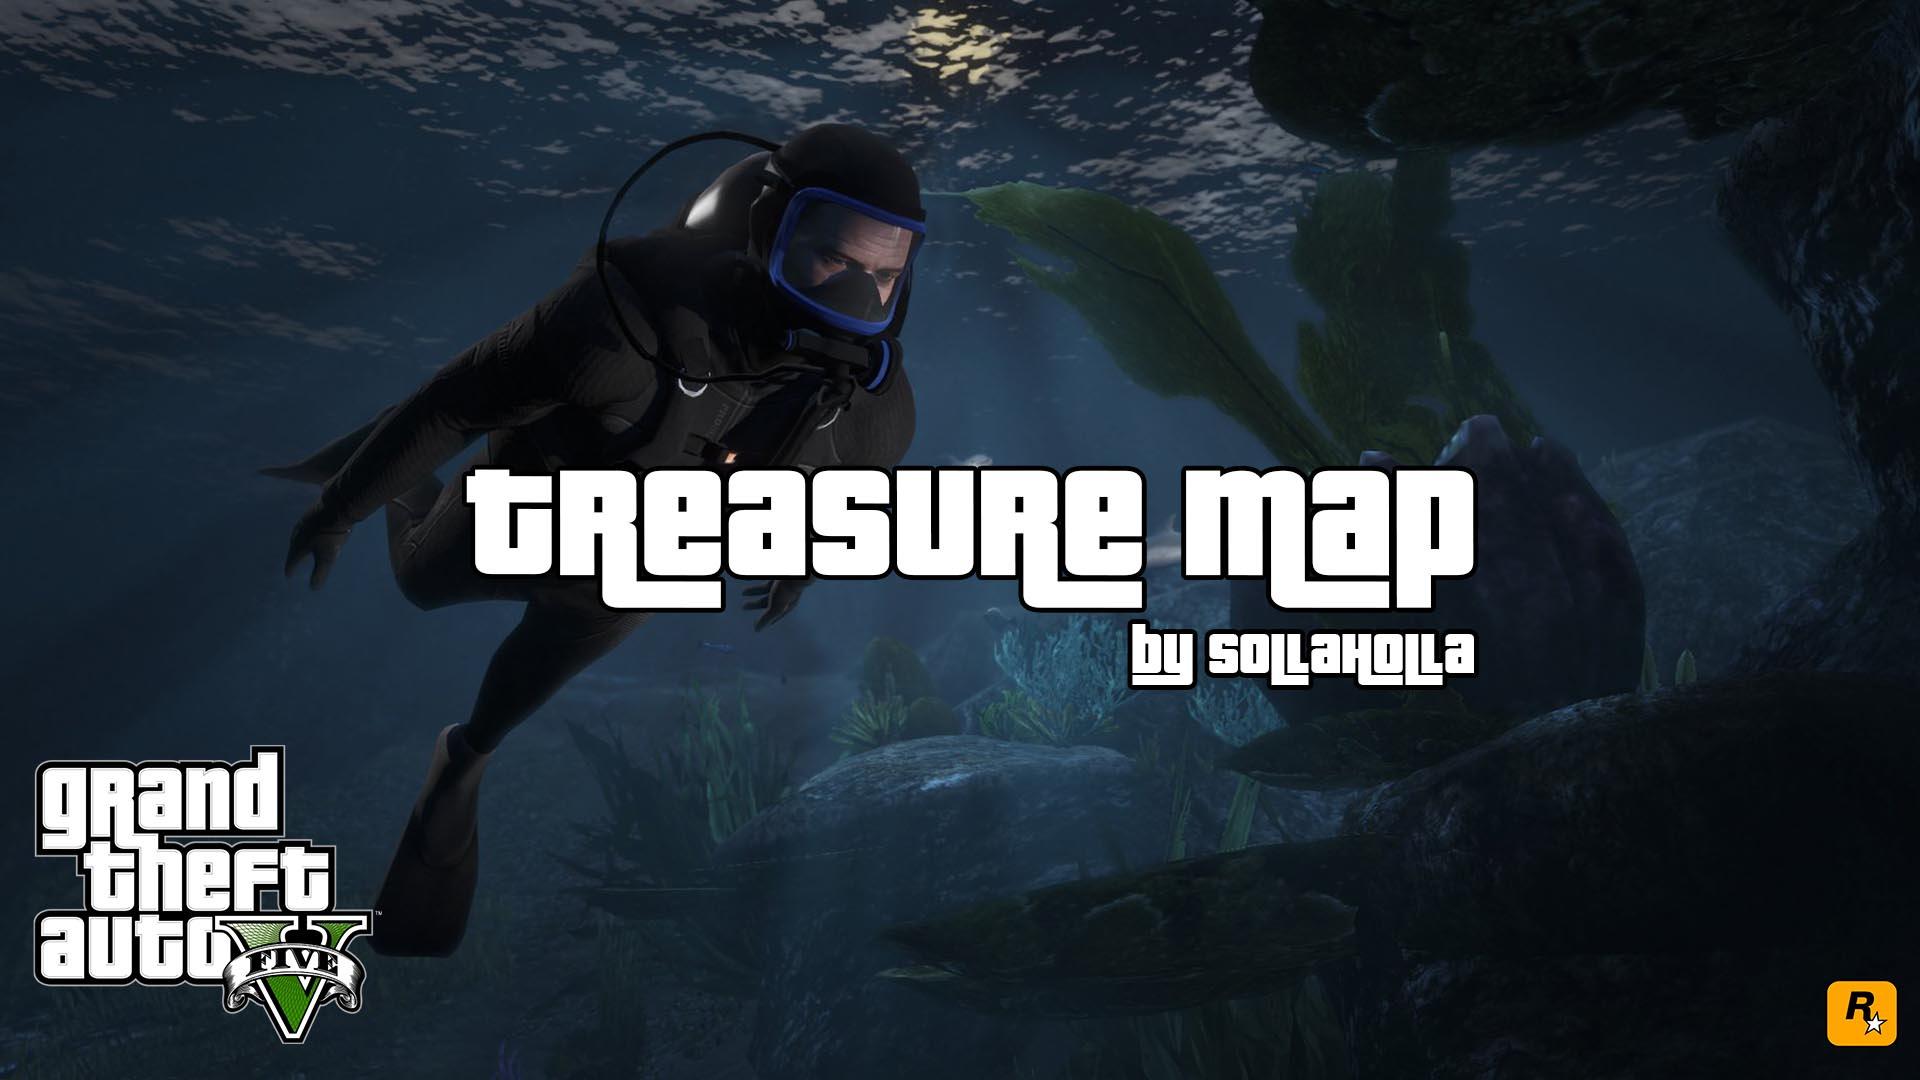 treasure map gta gta5 gtav mods liker mainimage play